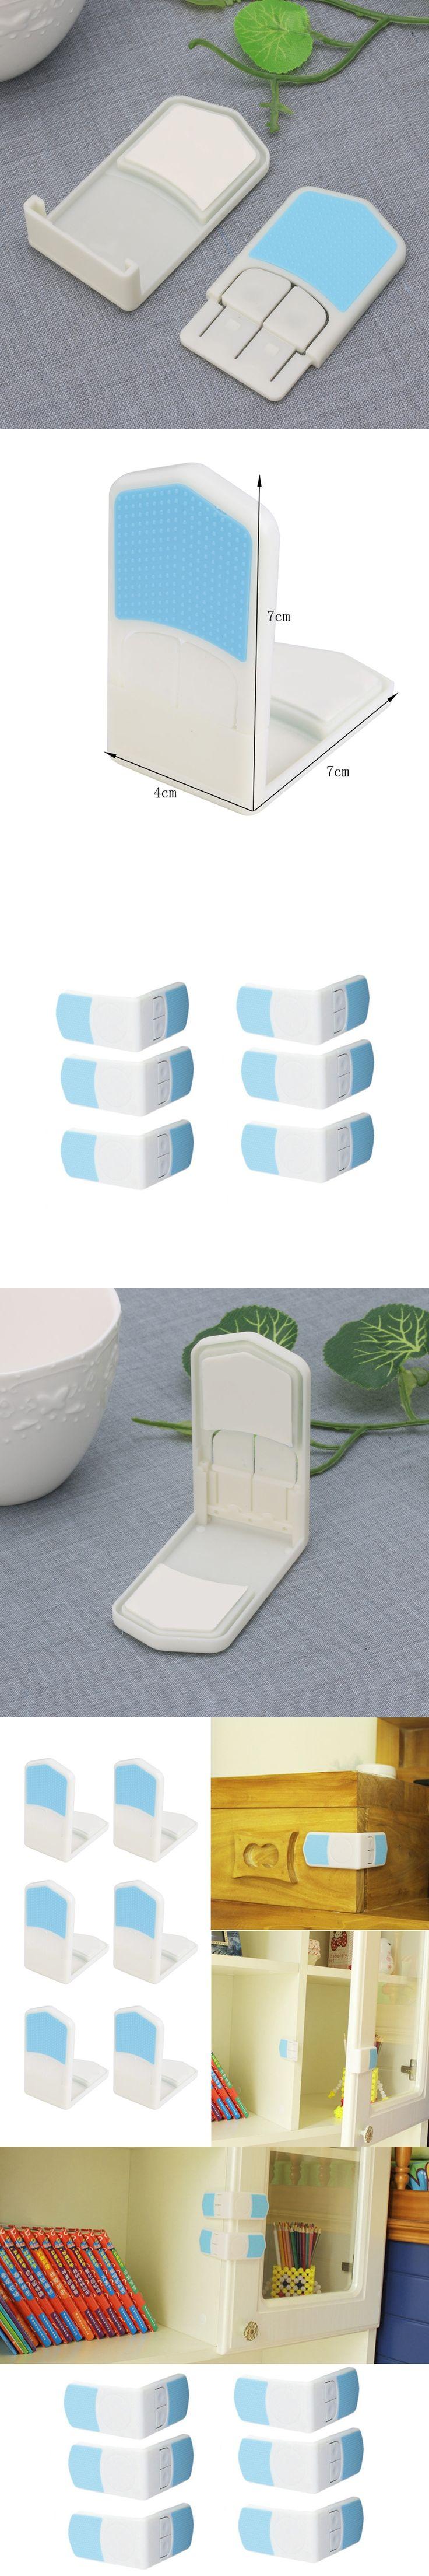 6Pcs Baby Child Safety Locking Plastic Cabinet Drawer Bathroom Door Protection